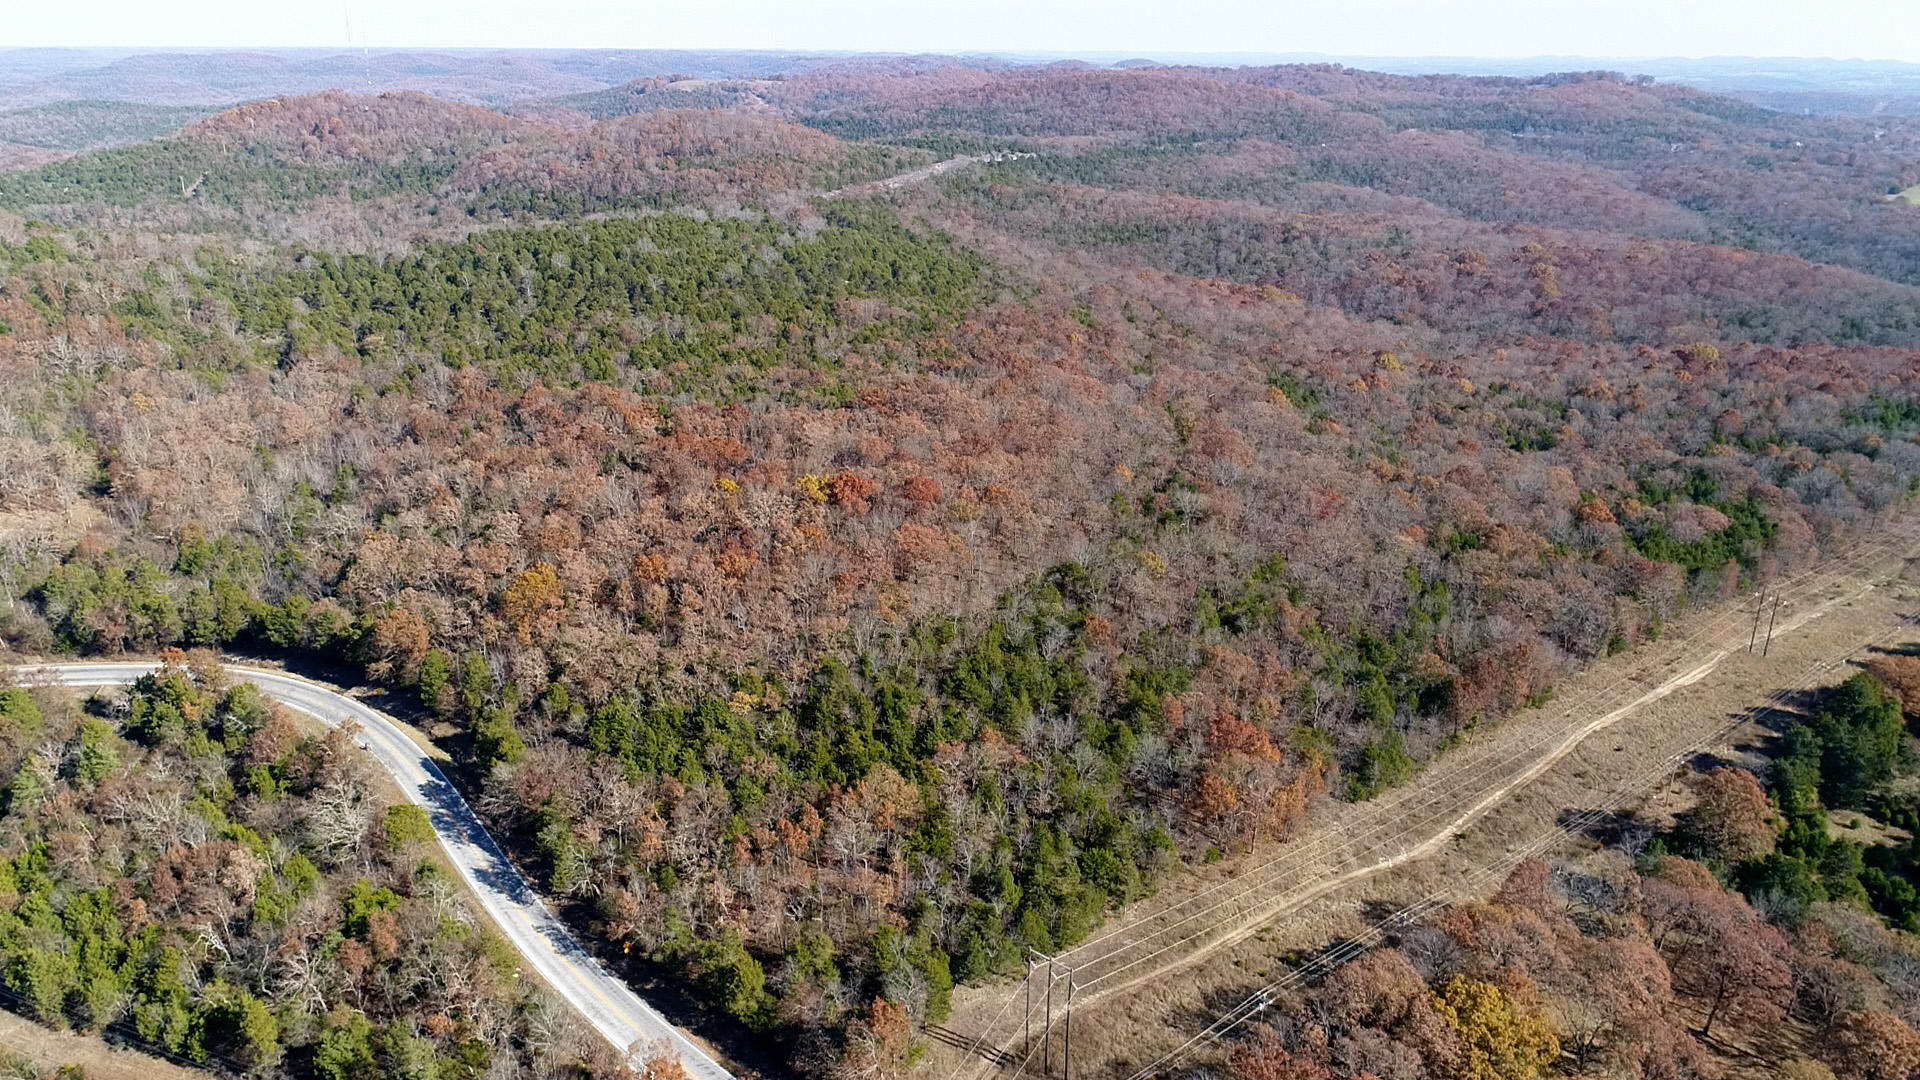 Tbd Highway 176 Merriam Woods, MO 65740